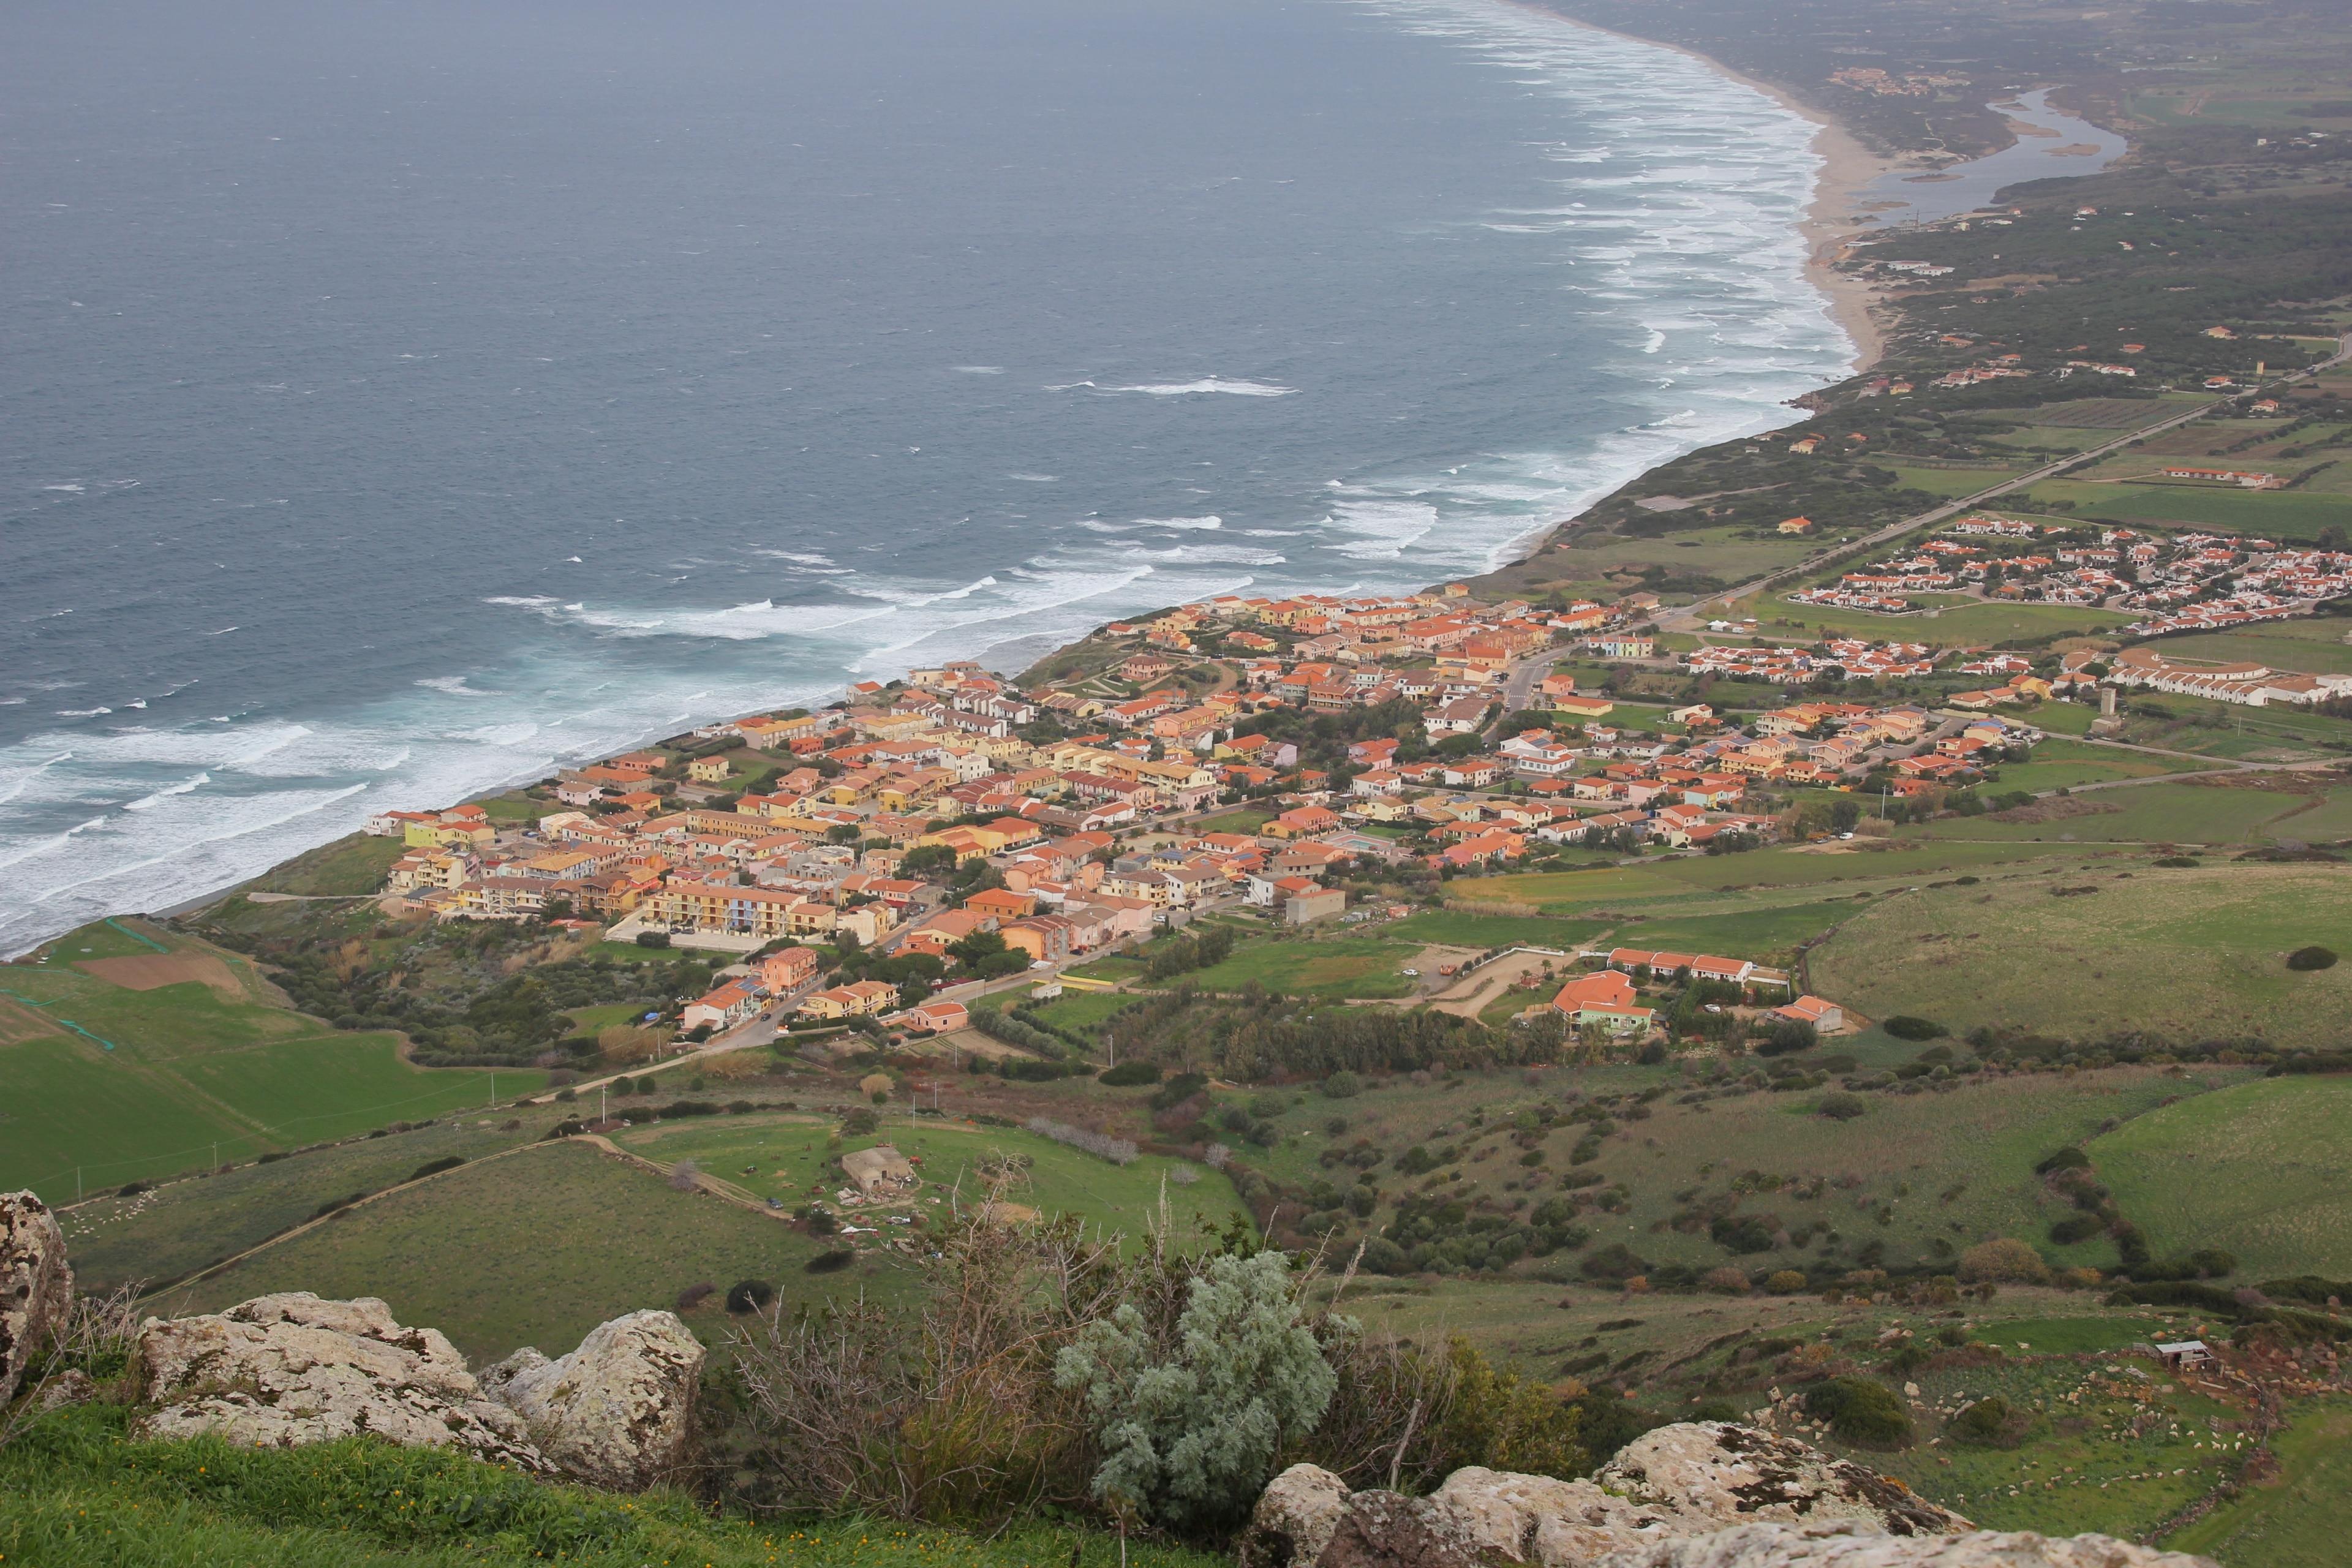 La Ciaccia, Valledoria, Sardinia, Italy